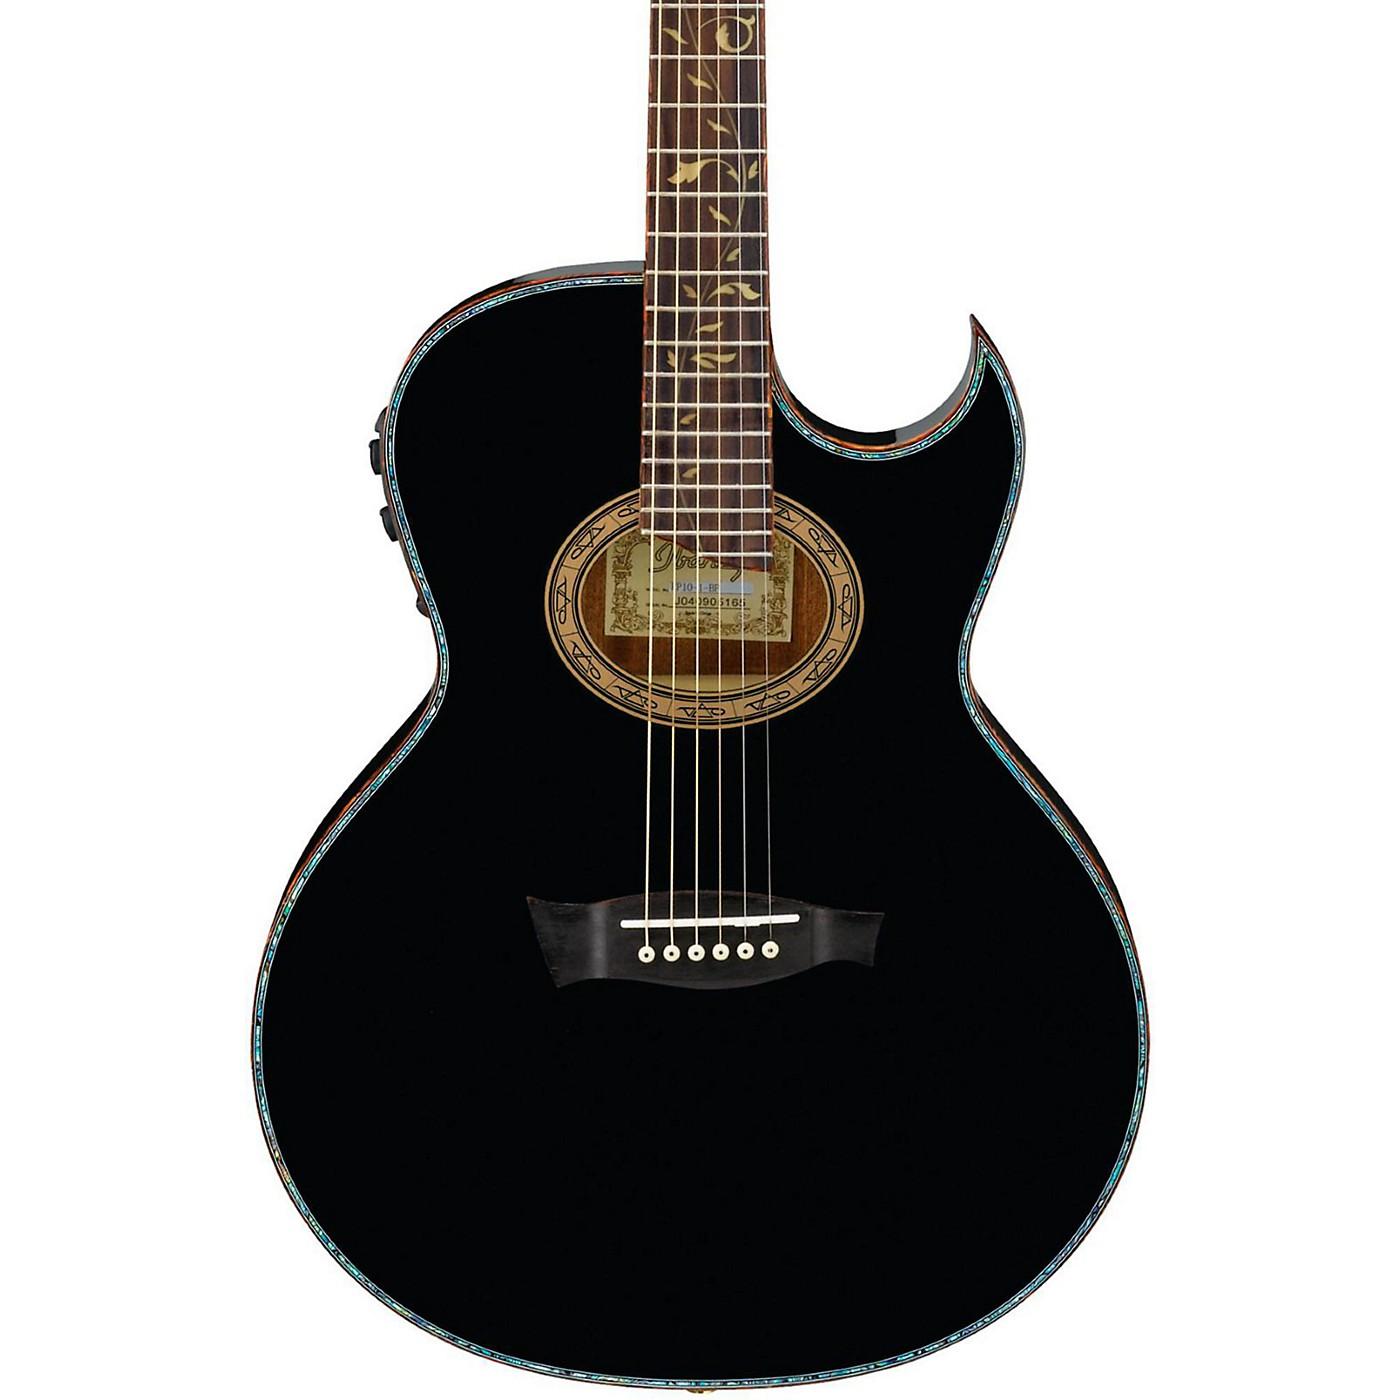 Ibanez Euphoria Steve Vai All Solid Wood Signature Acoustic-Electric Guitar thumbnail